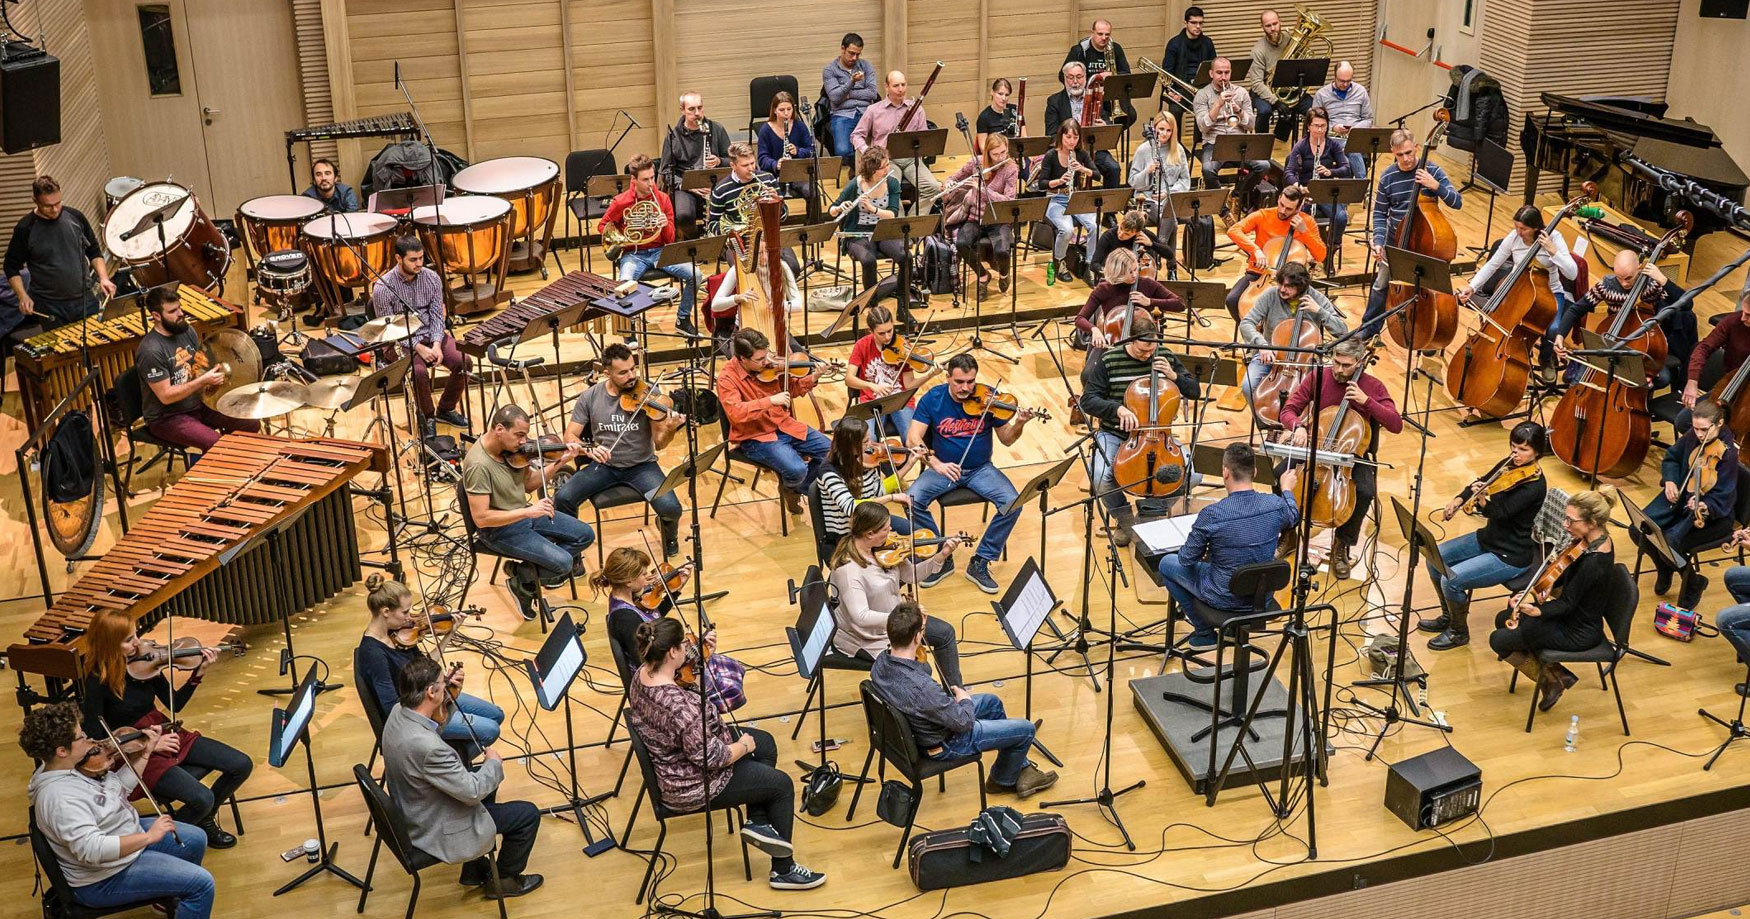 Zagreb Festival Orchestra in concert